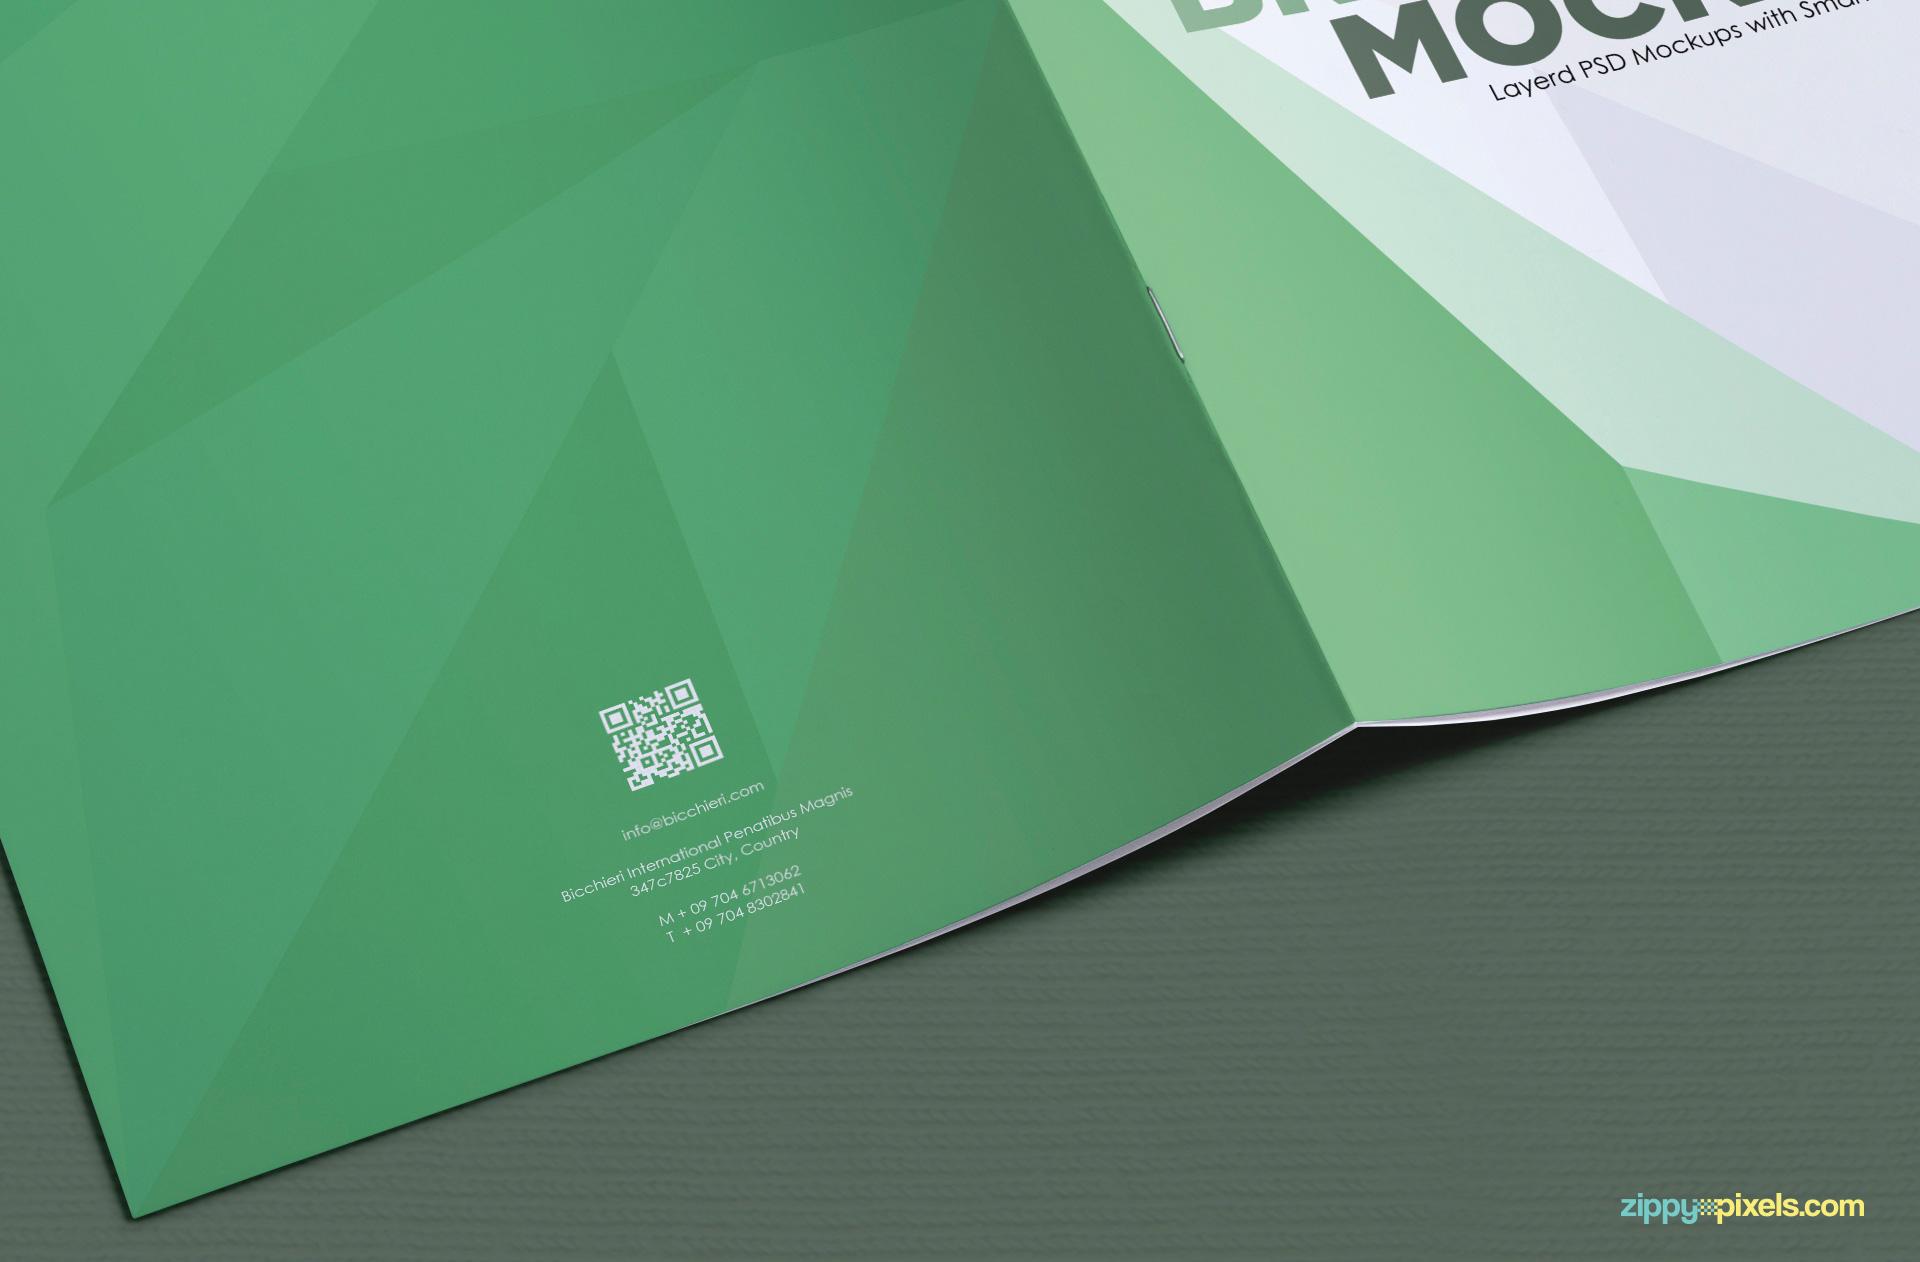 04-free-editable-a4-brochure-PSD-mockup-824x542